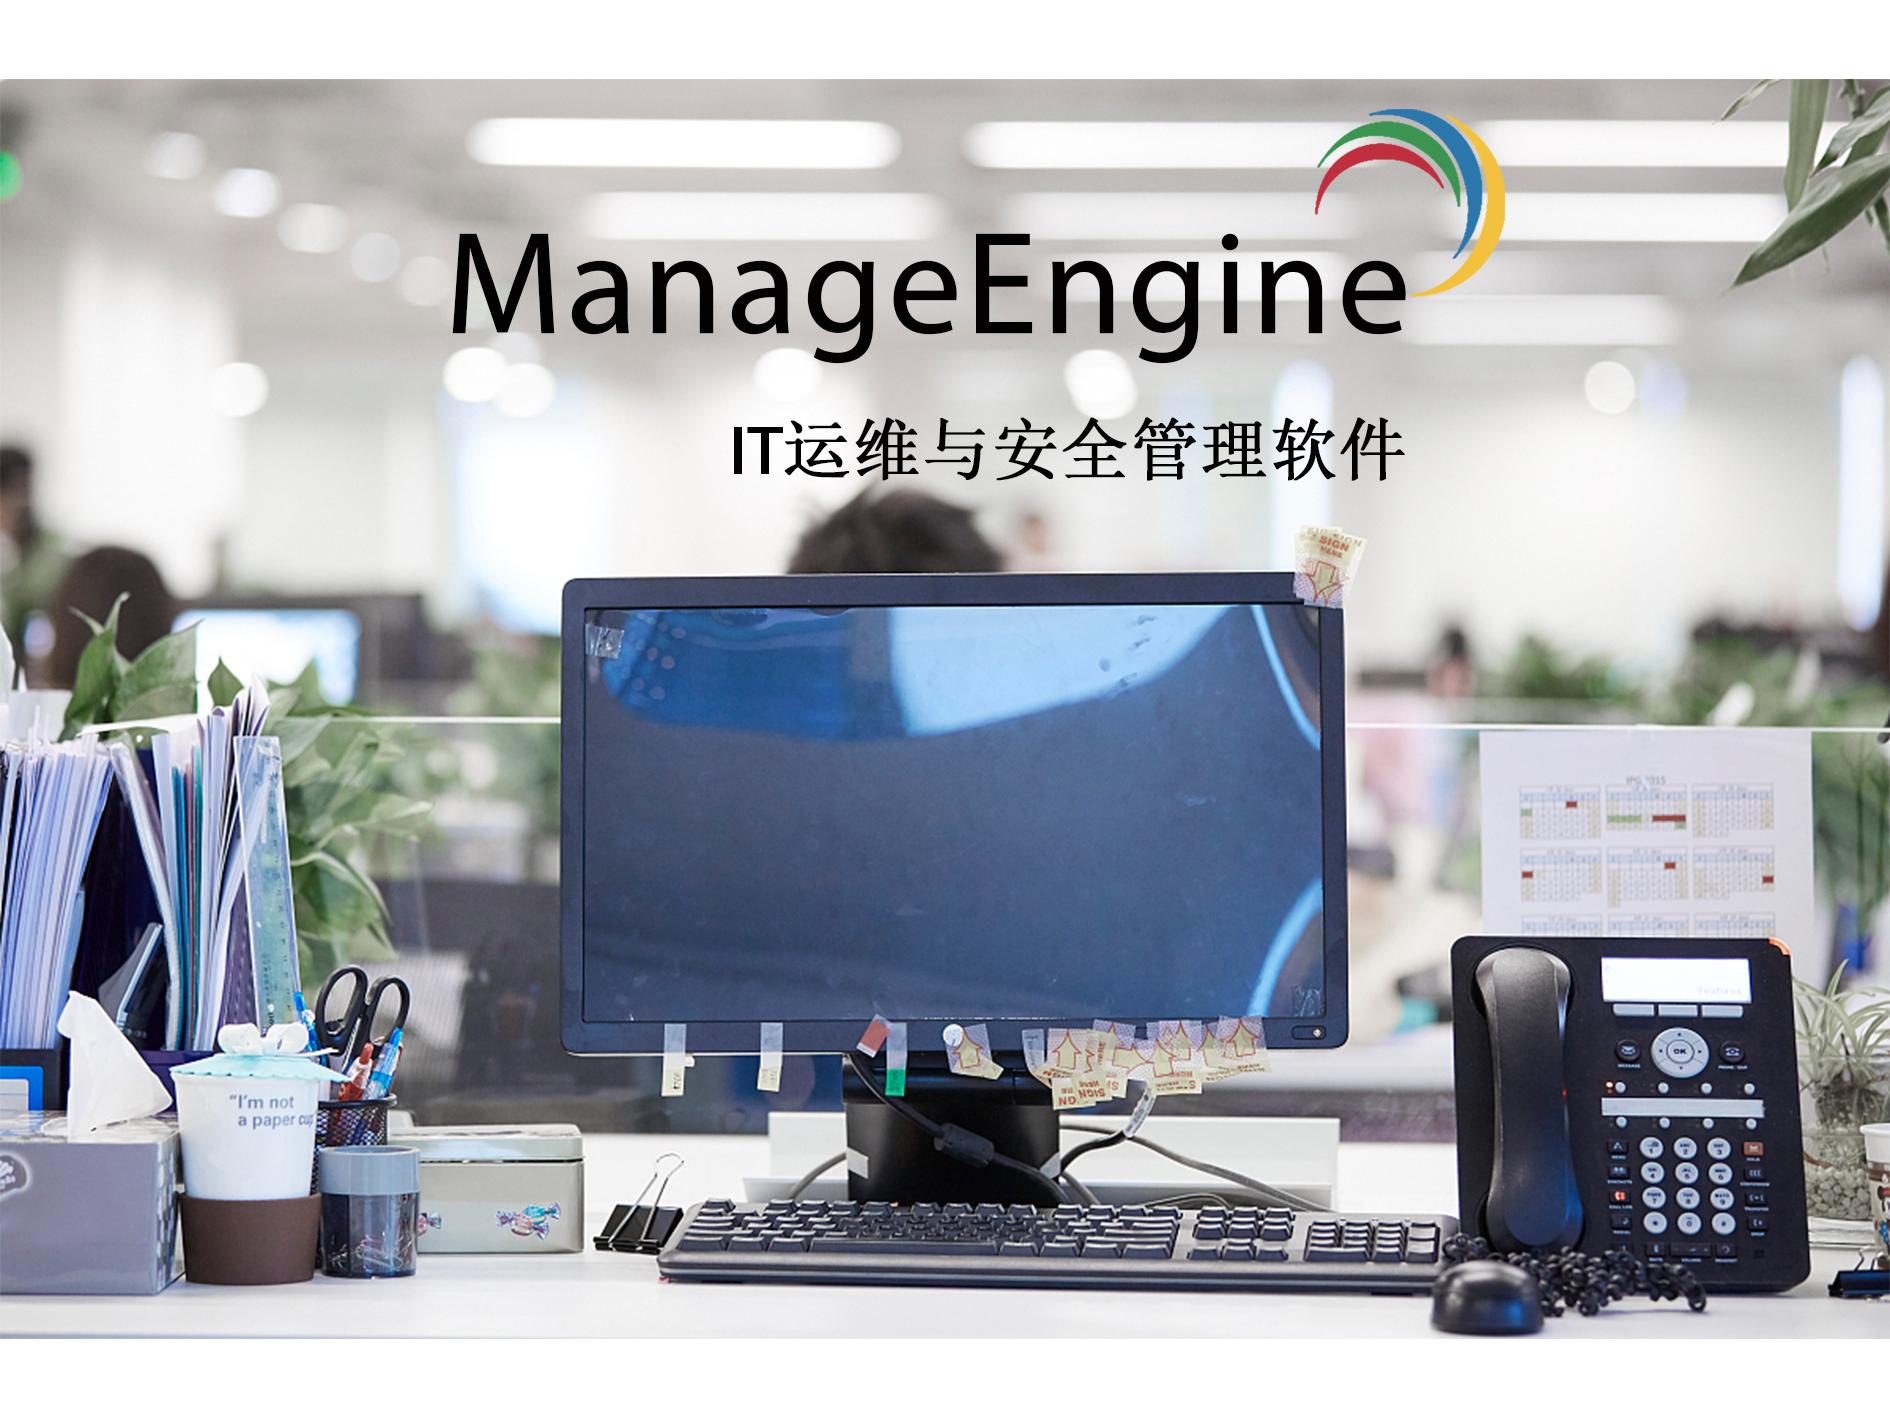 IT服务团队 - ManageEngine IT服务管理